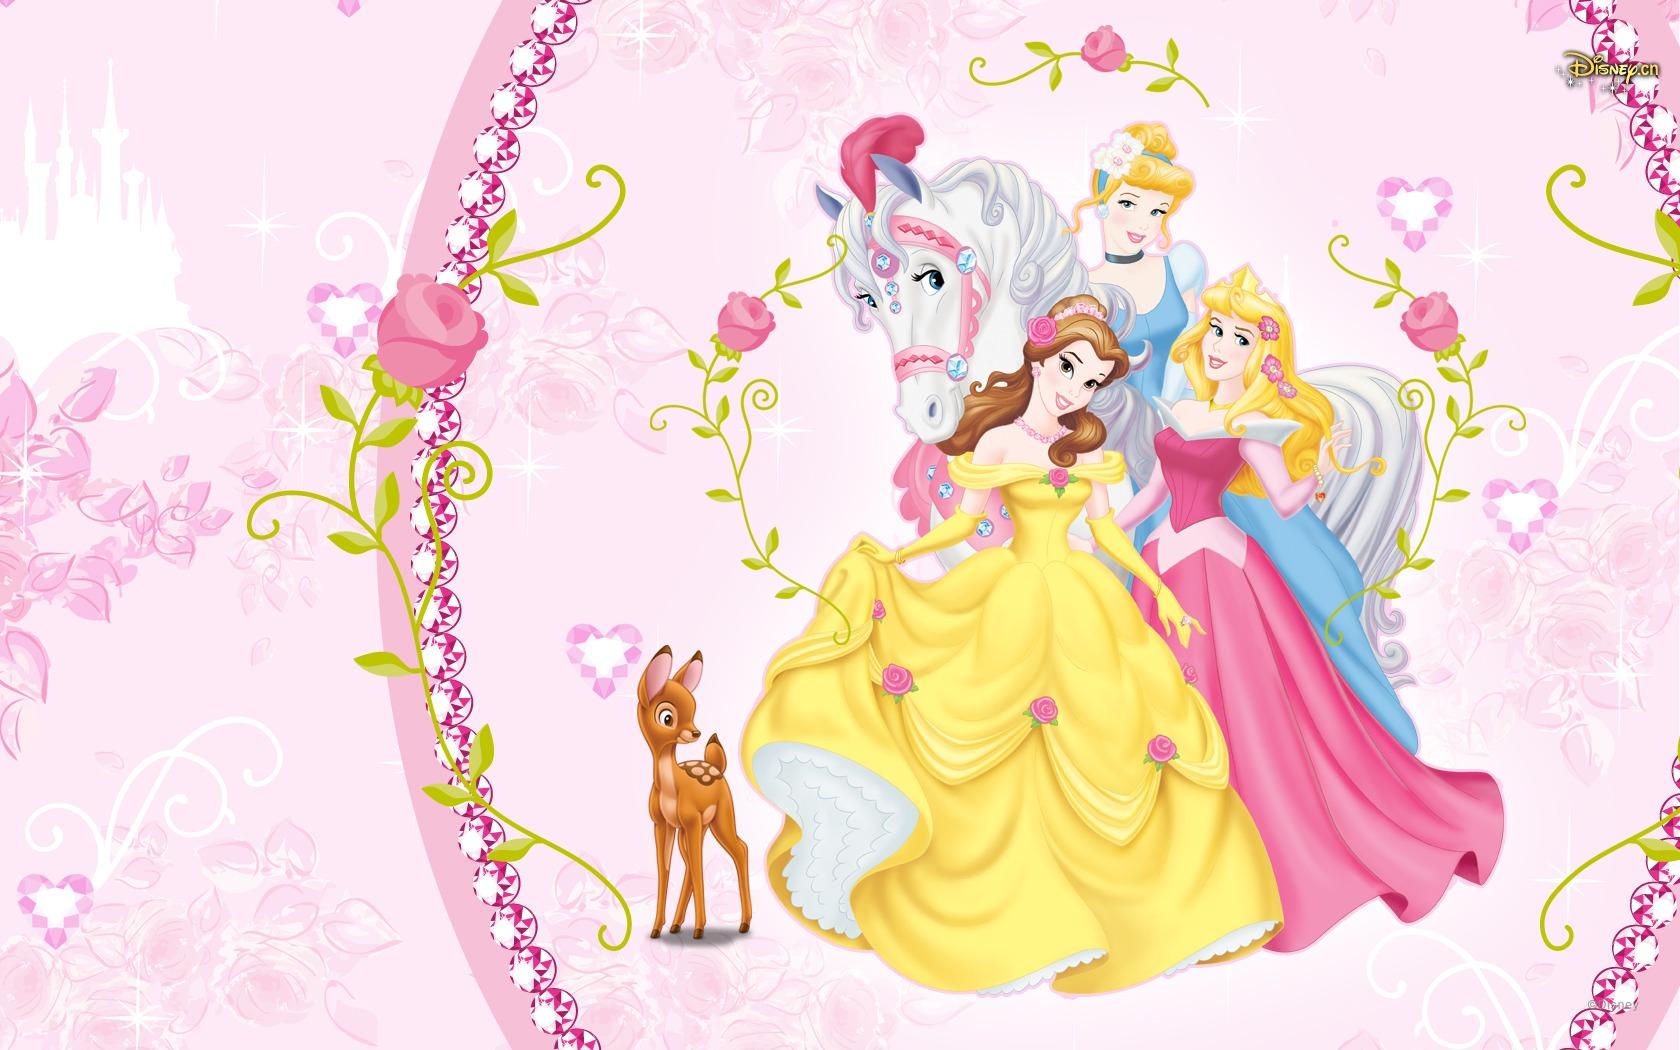 Disney Princess - Disney Princess Wallpaper (33693783 ...